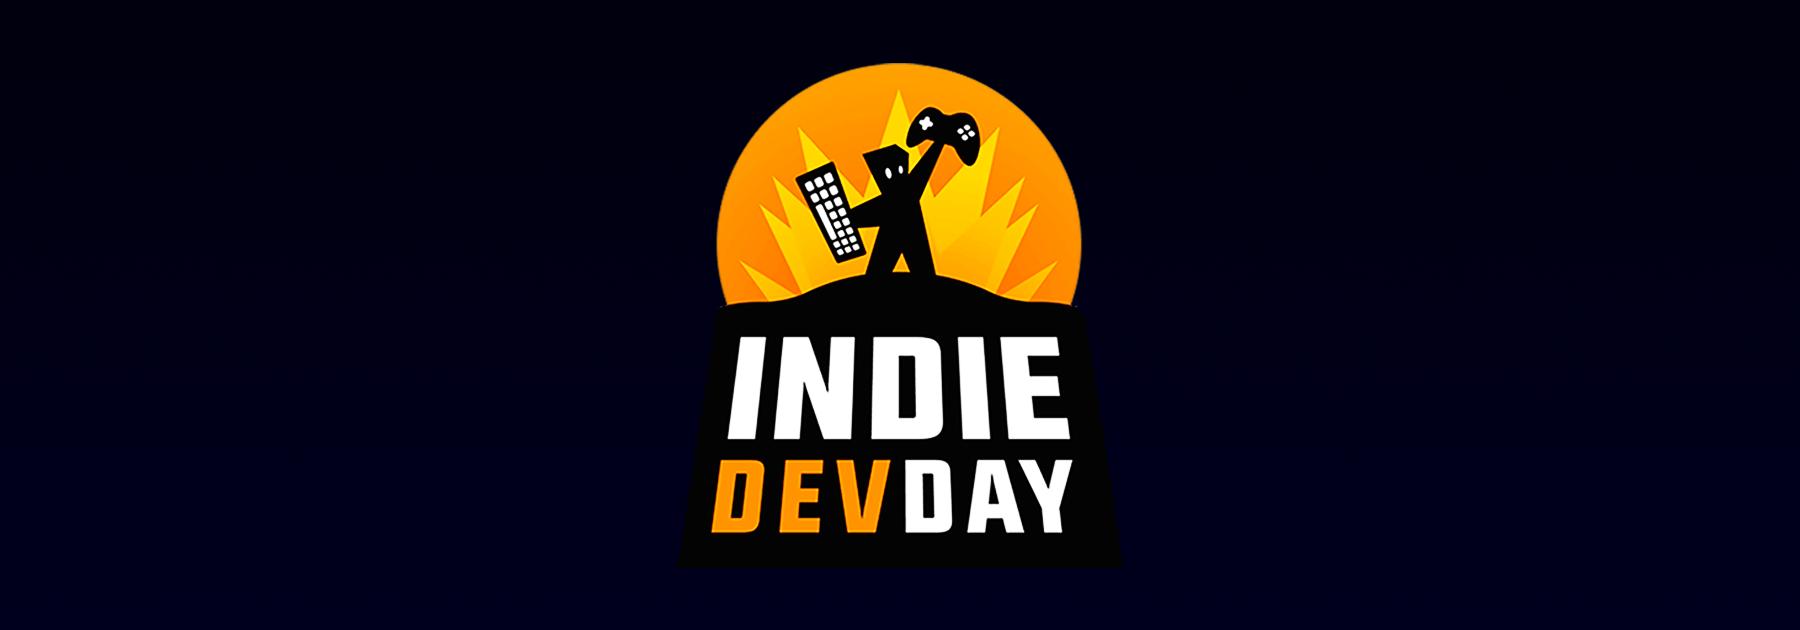 Cabecera del Indie Dev Day 2021